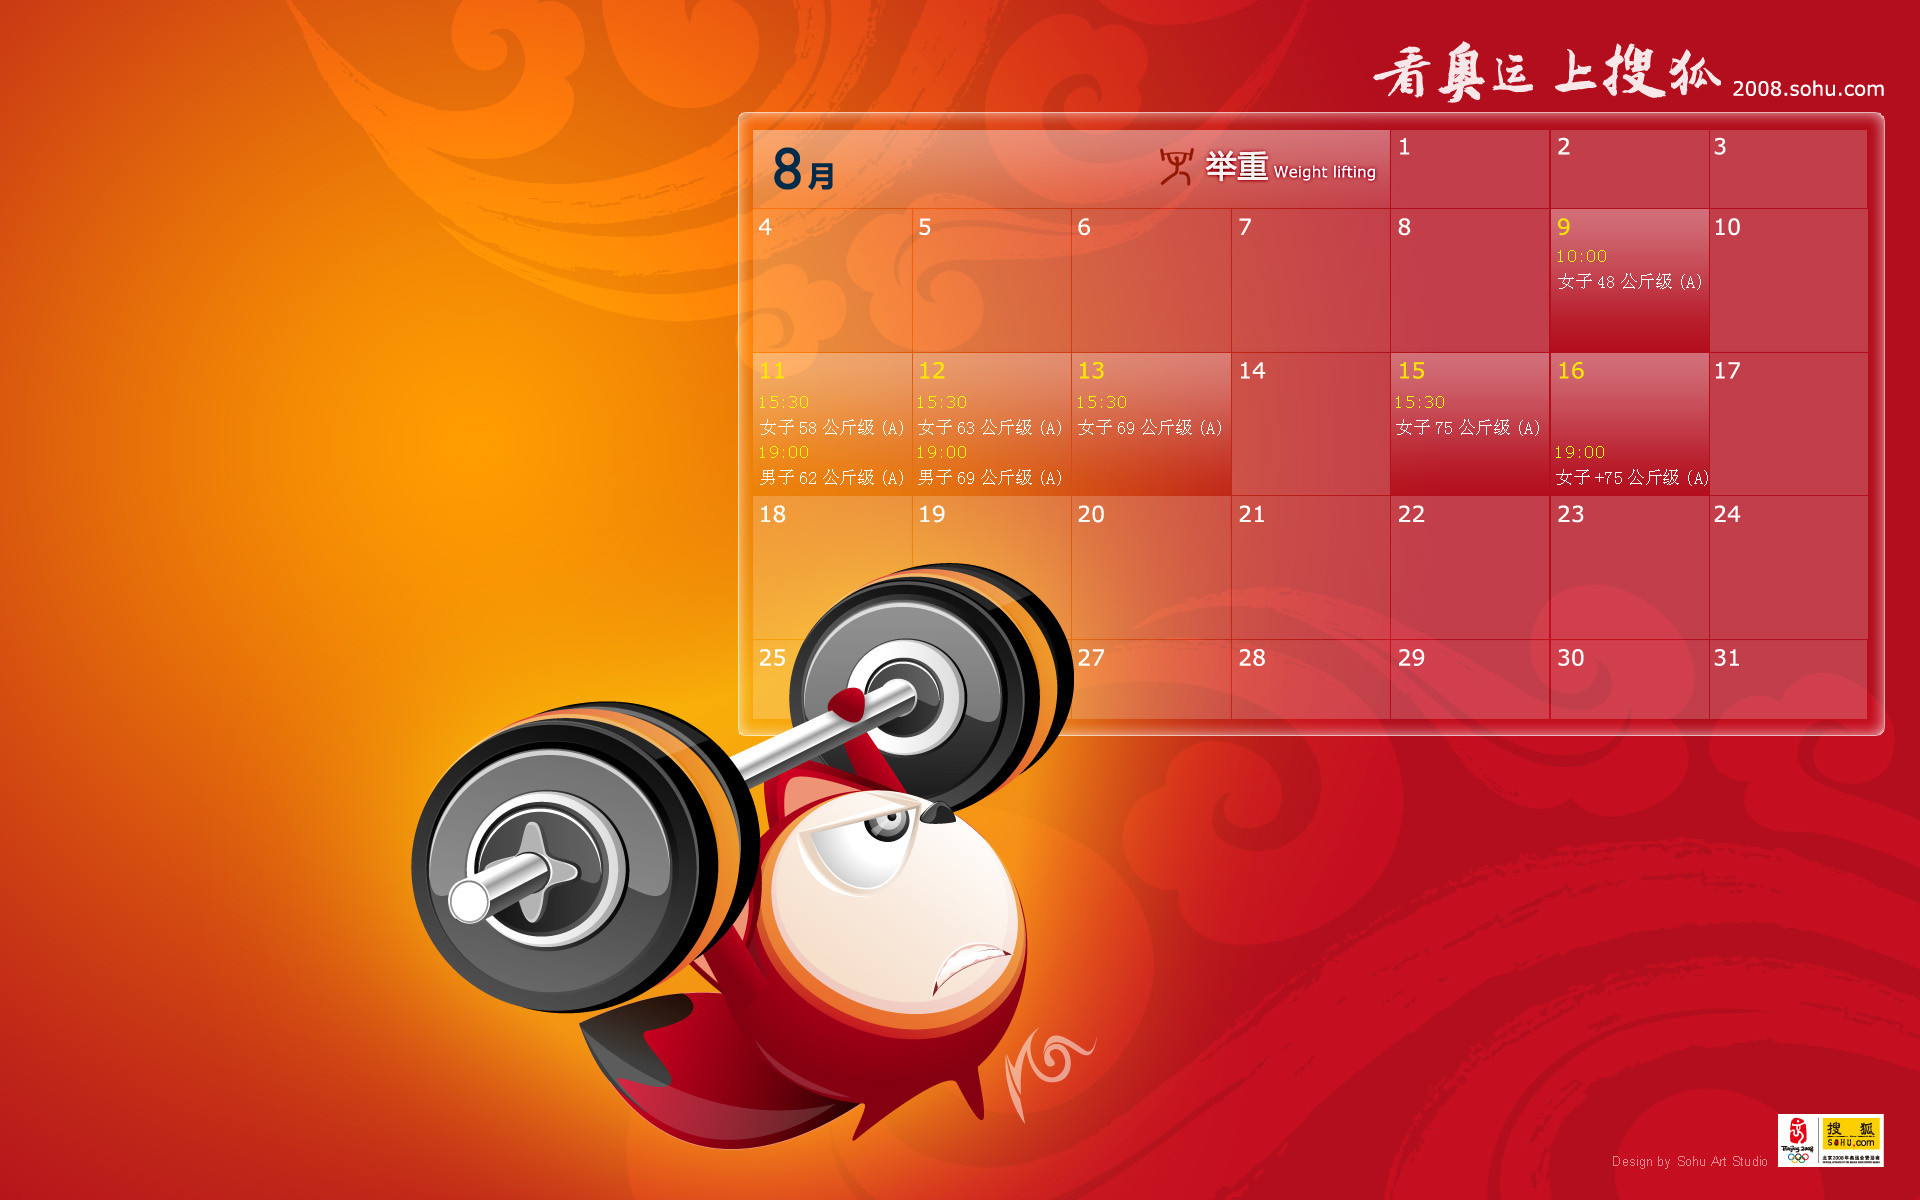 sohu Olympics desktop wallpaper 5#